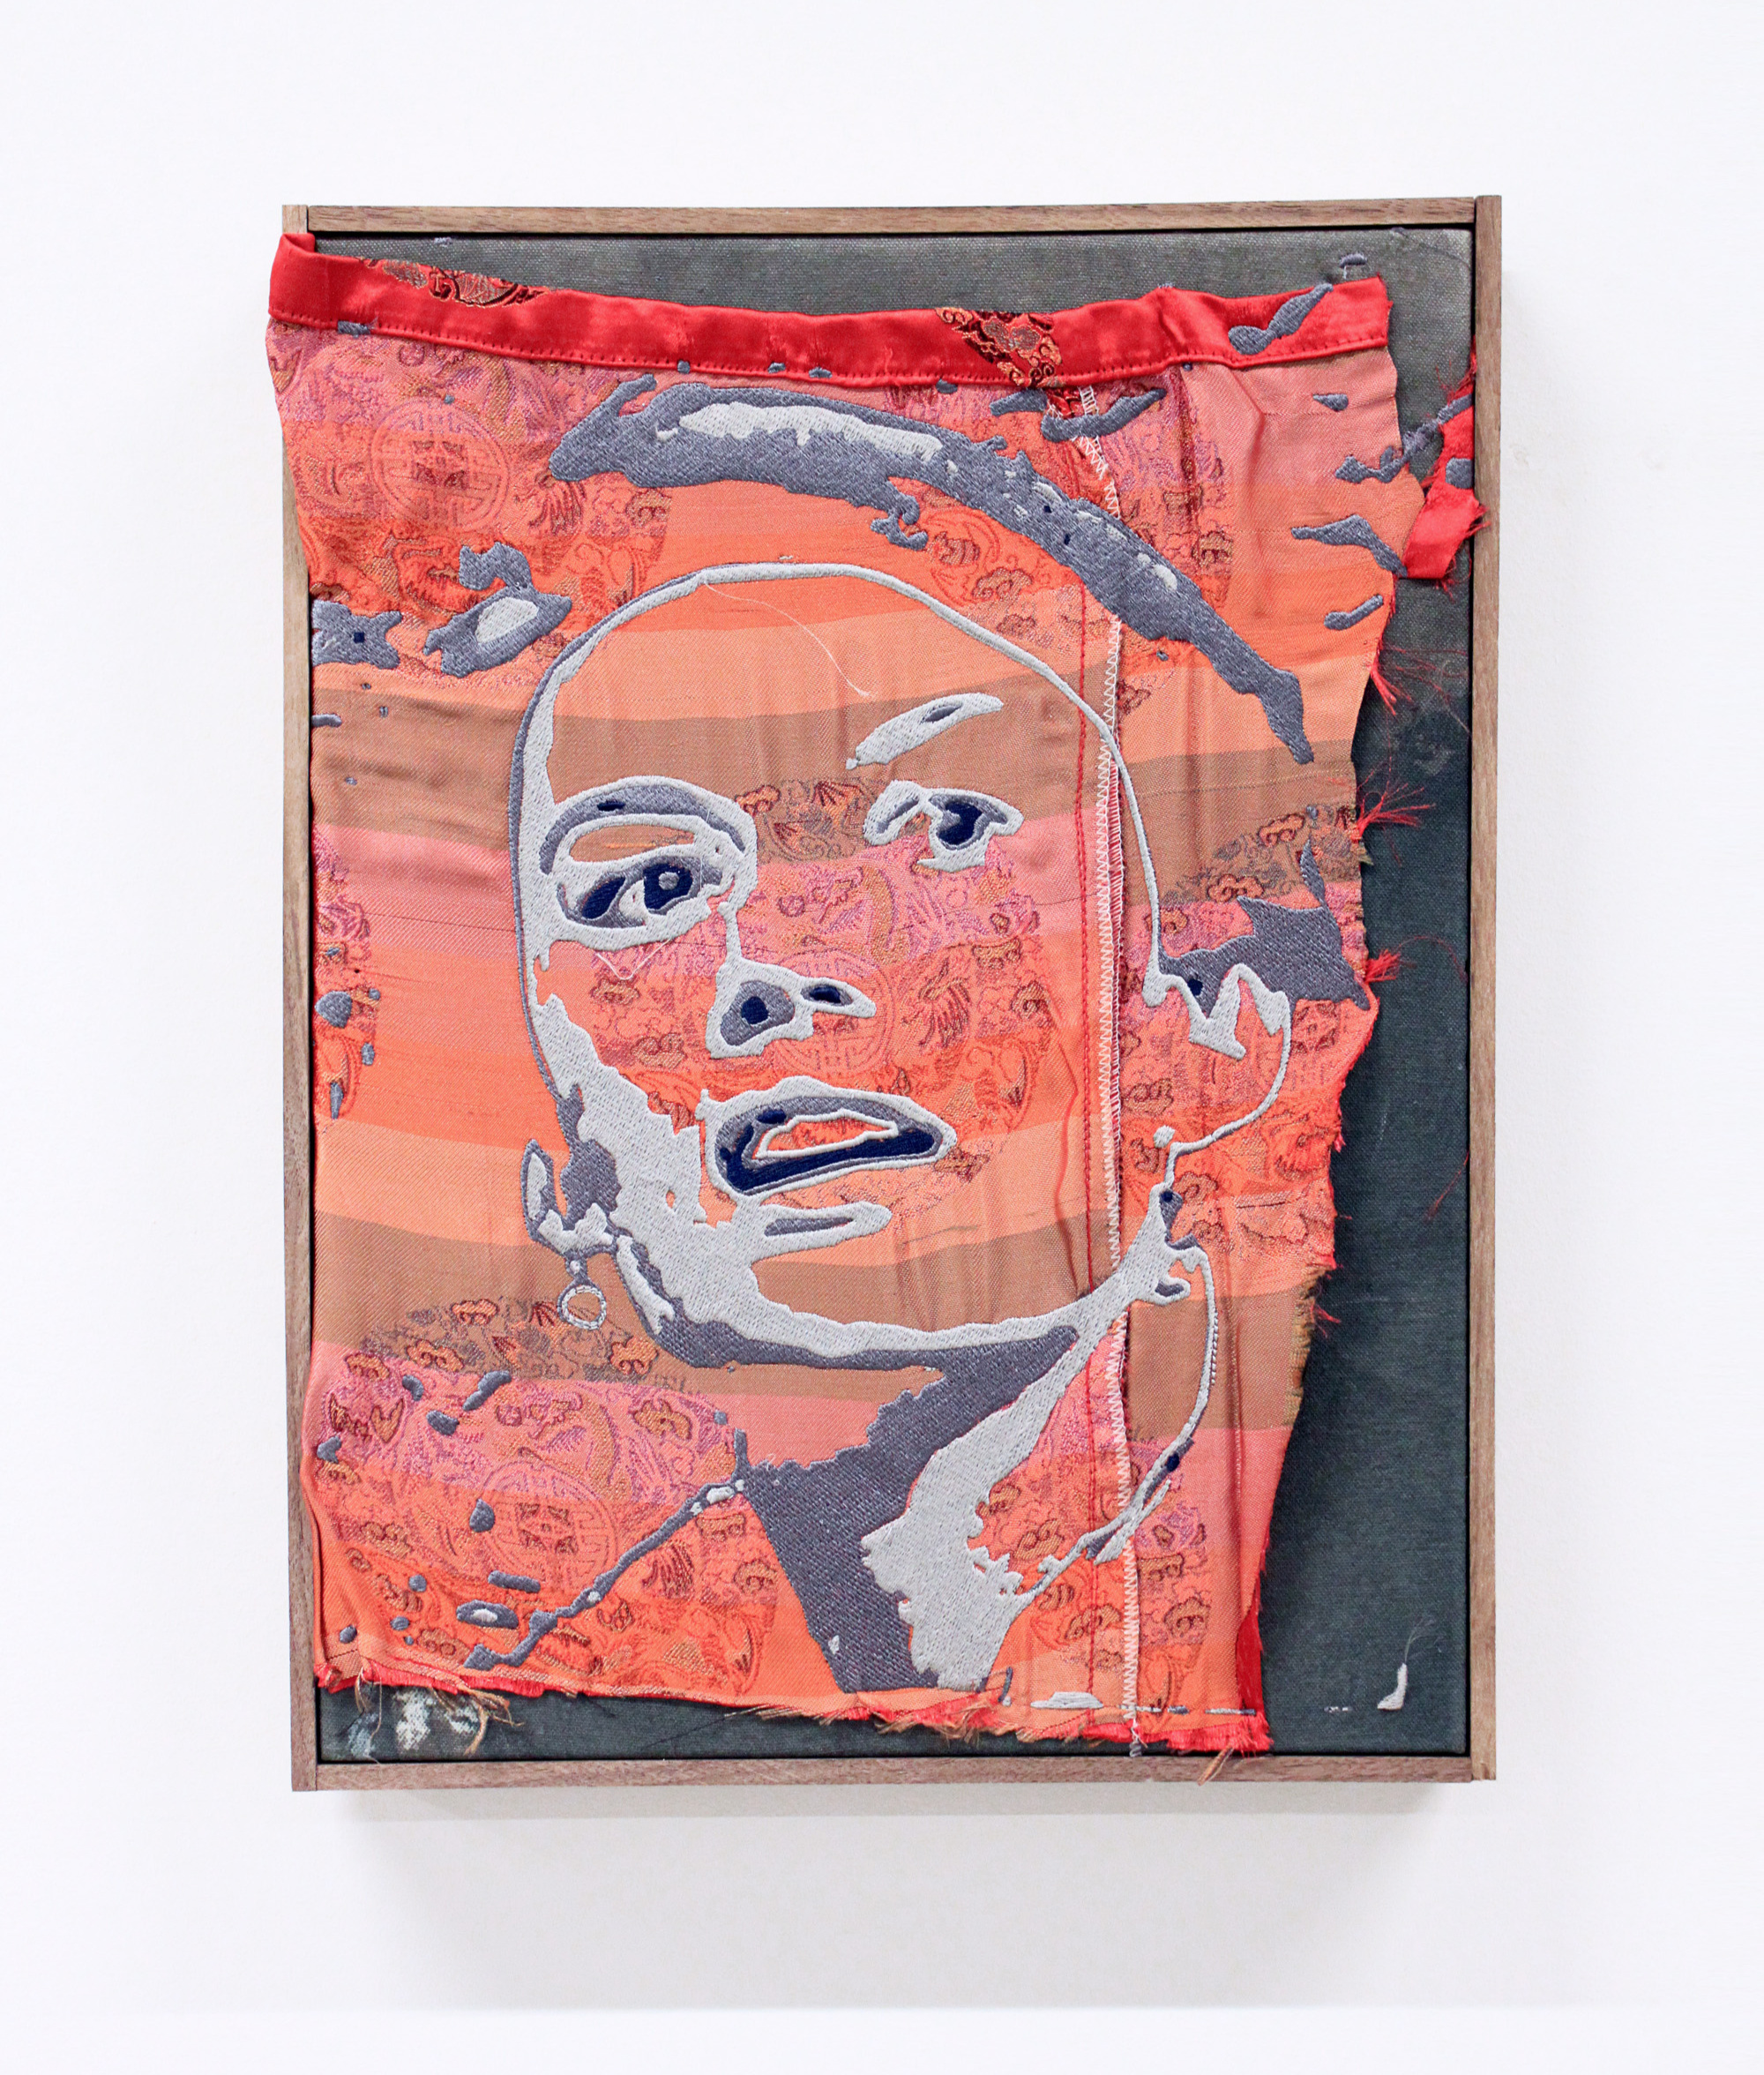 BRENDAN FOWLER  Andrea , 2016, Embroidery on found fabric, acrylic, canvas, artist frame